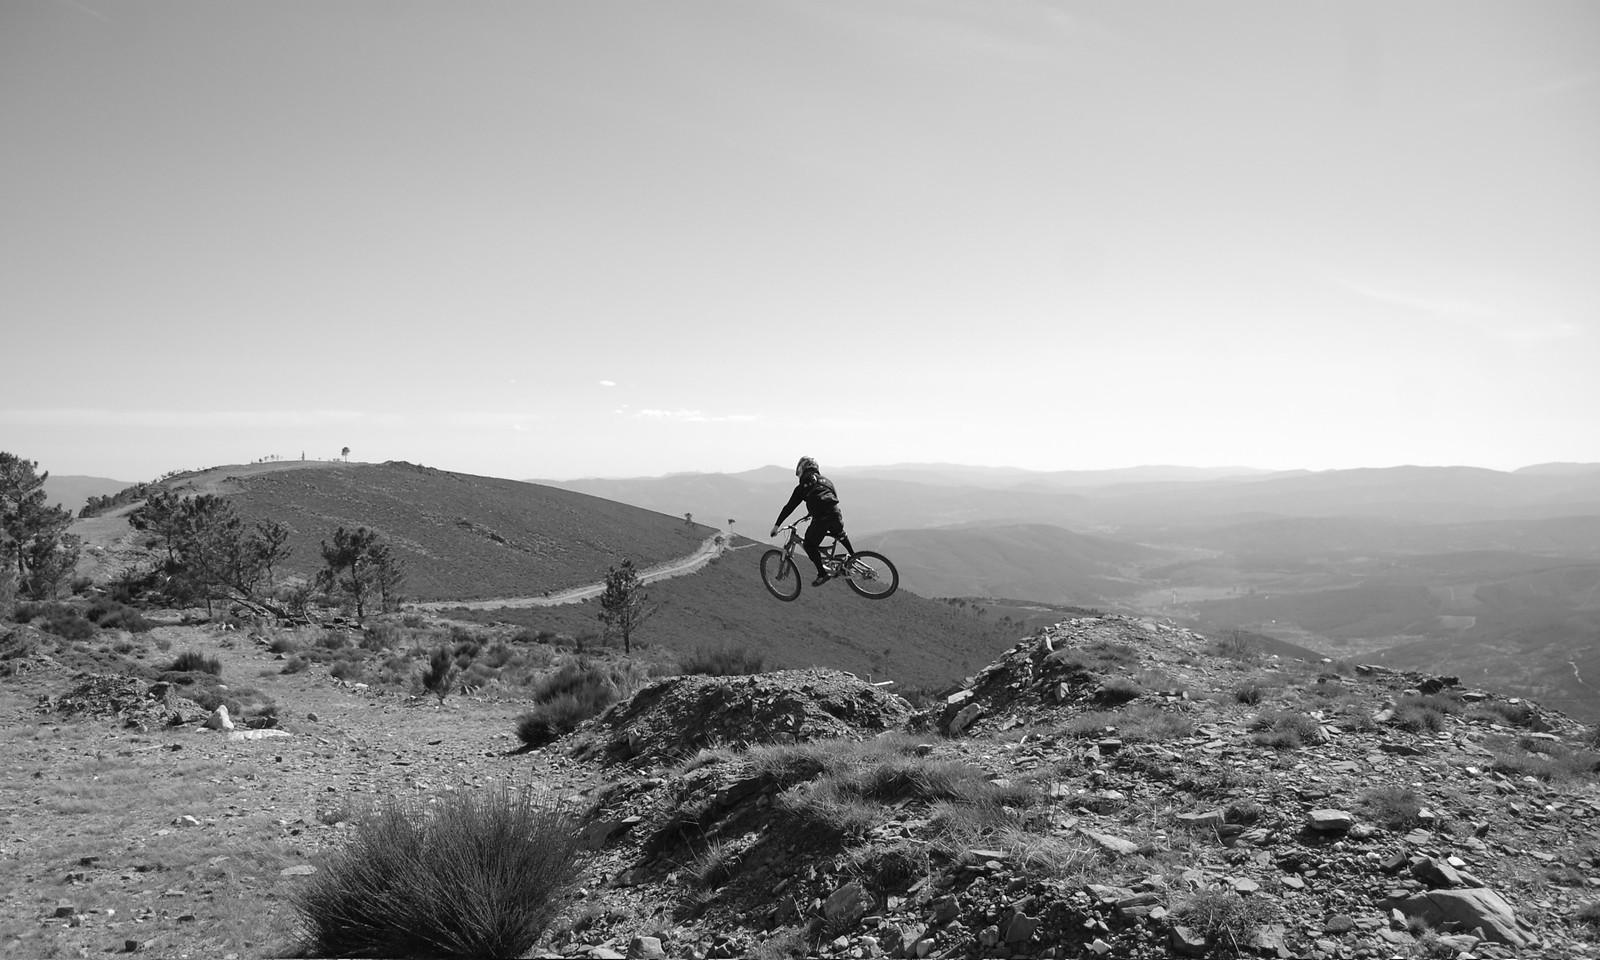 Training day 21.04.13 - antonio.mendes.3363 - Mountain Biking Pictures - Vital MTB